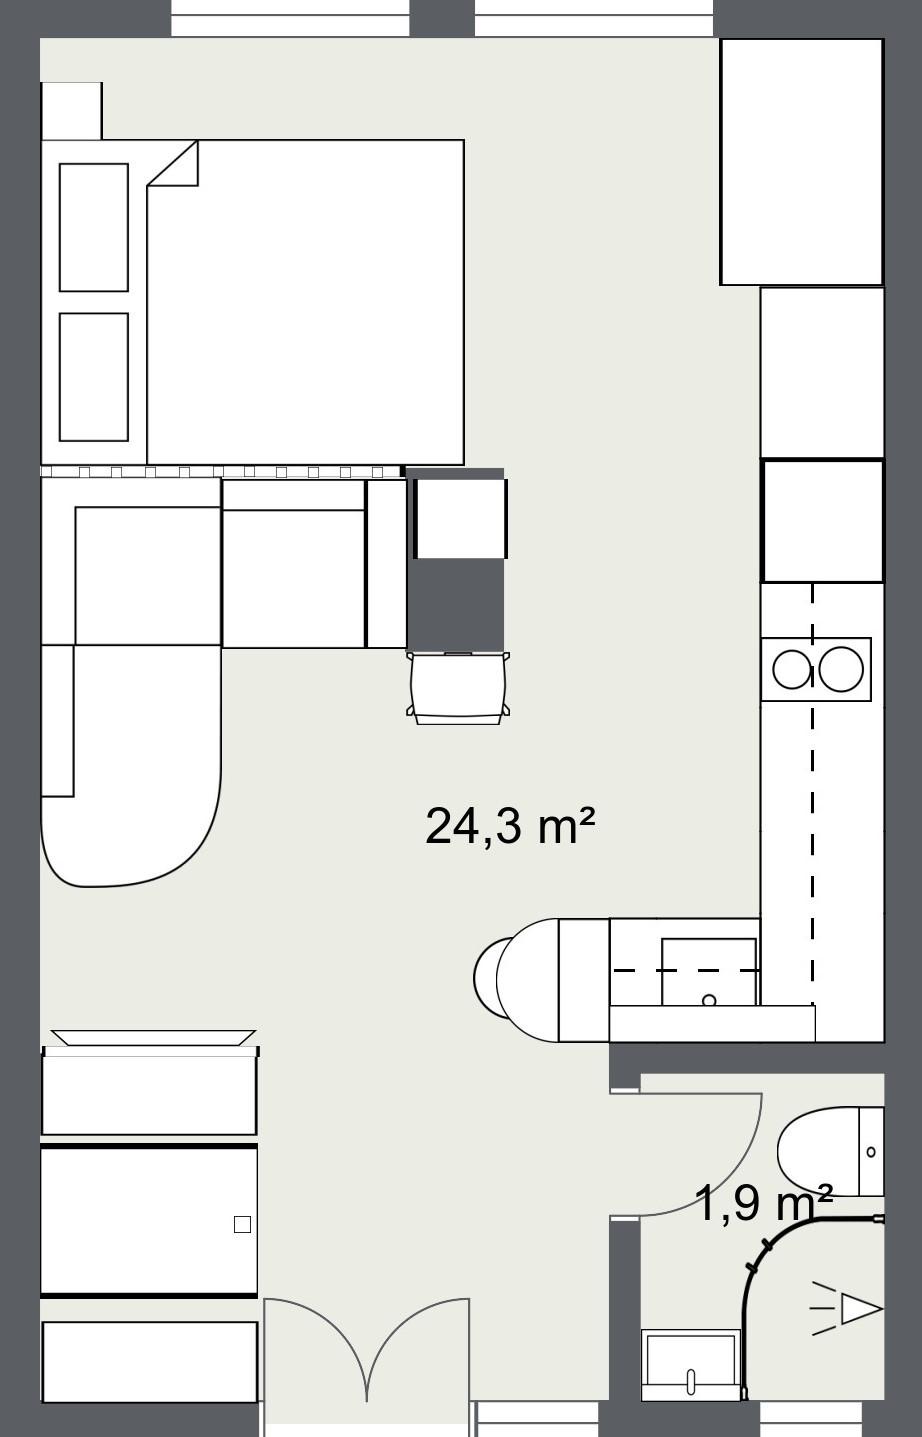 tlocrt stan 25 m2, varijanta 1- srušeni zidovi